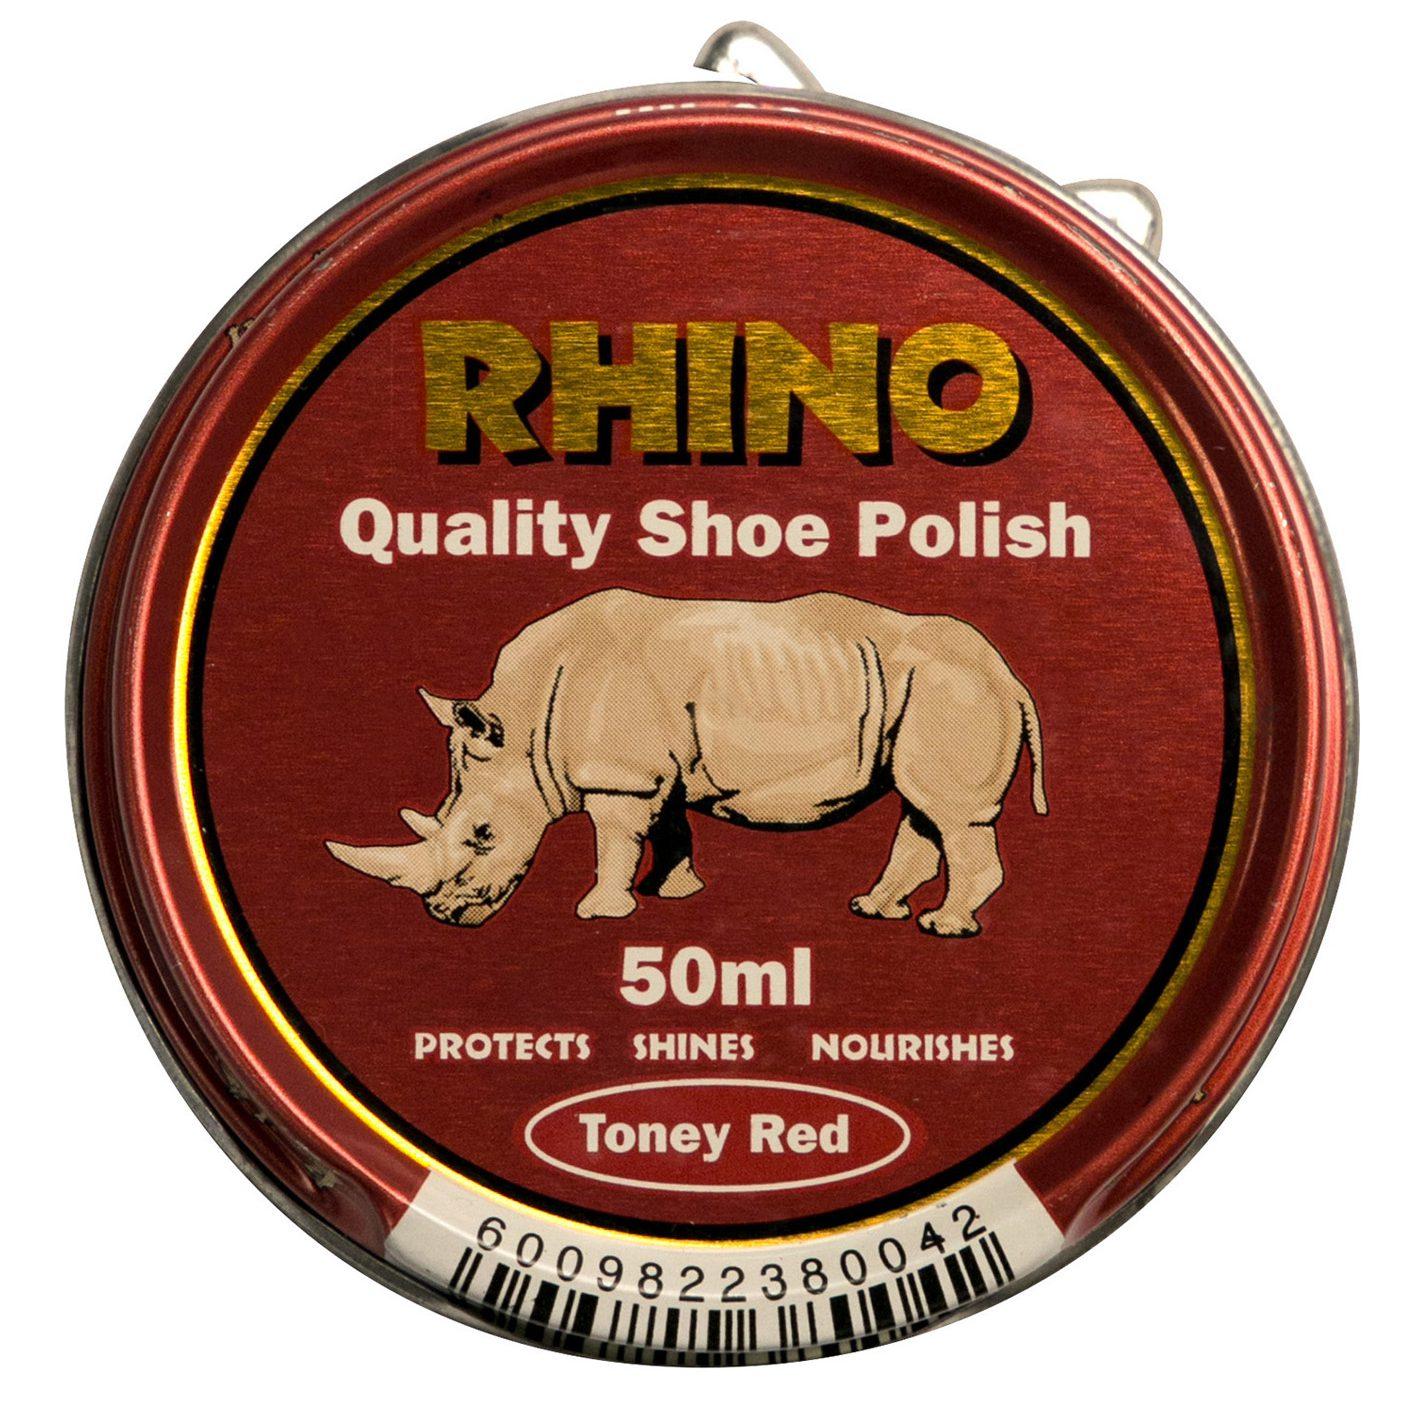 Rhino Shoe Polish Toney Red 50ml